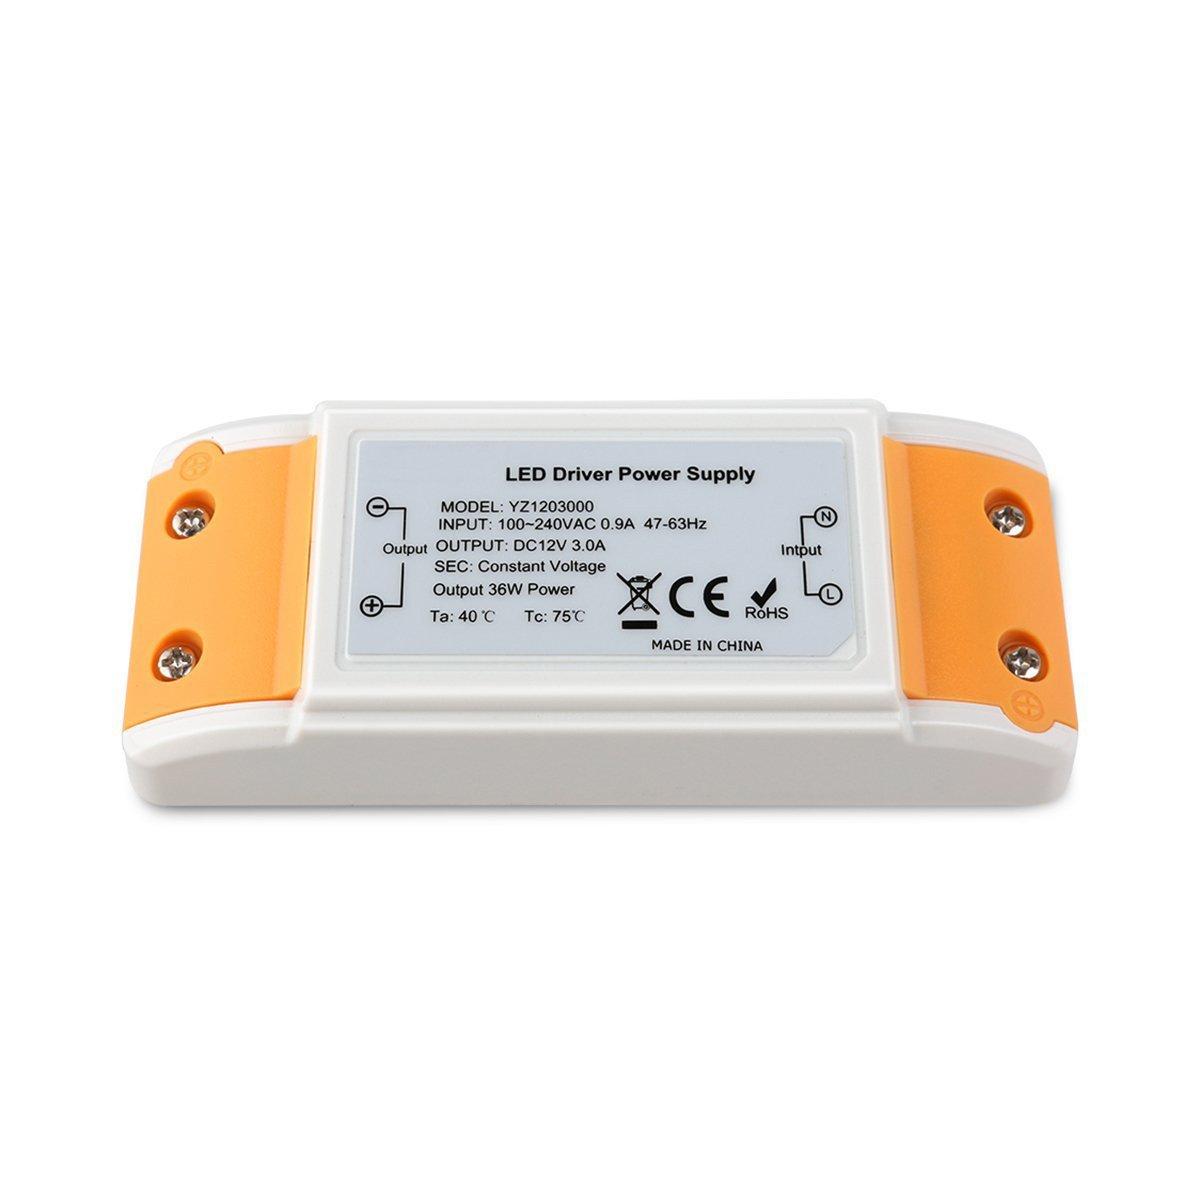 iCreatin LED Transformer Power Supply 3A 12V DC36W ,Constant Voltage for LED Strip Lights and G4, MR11, MR16 LED Light Bulbs (12V3A)